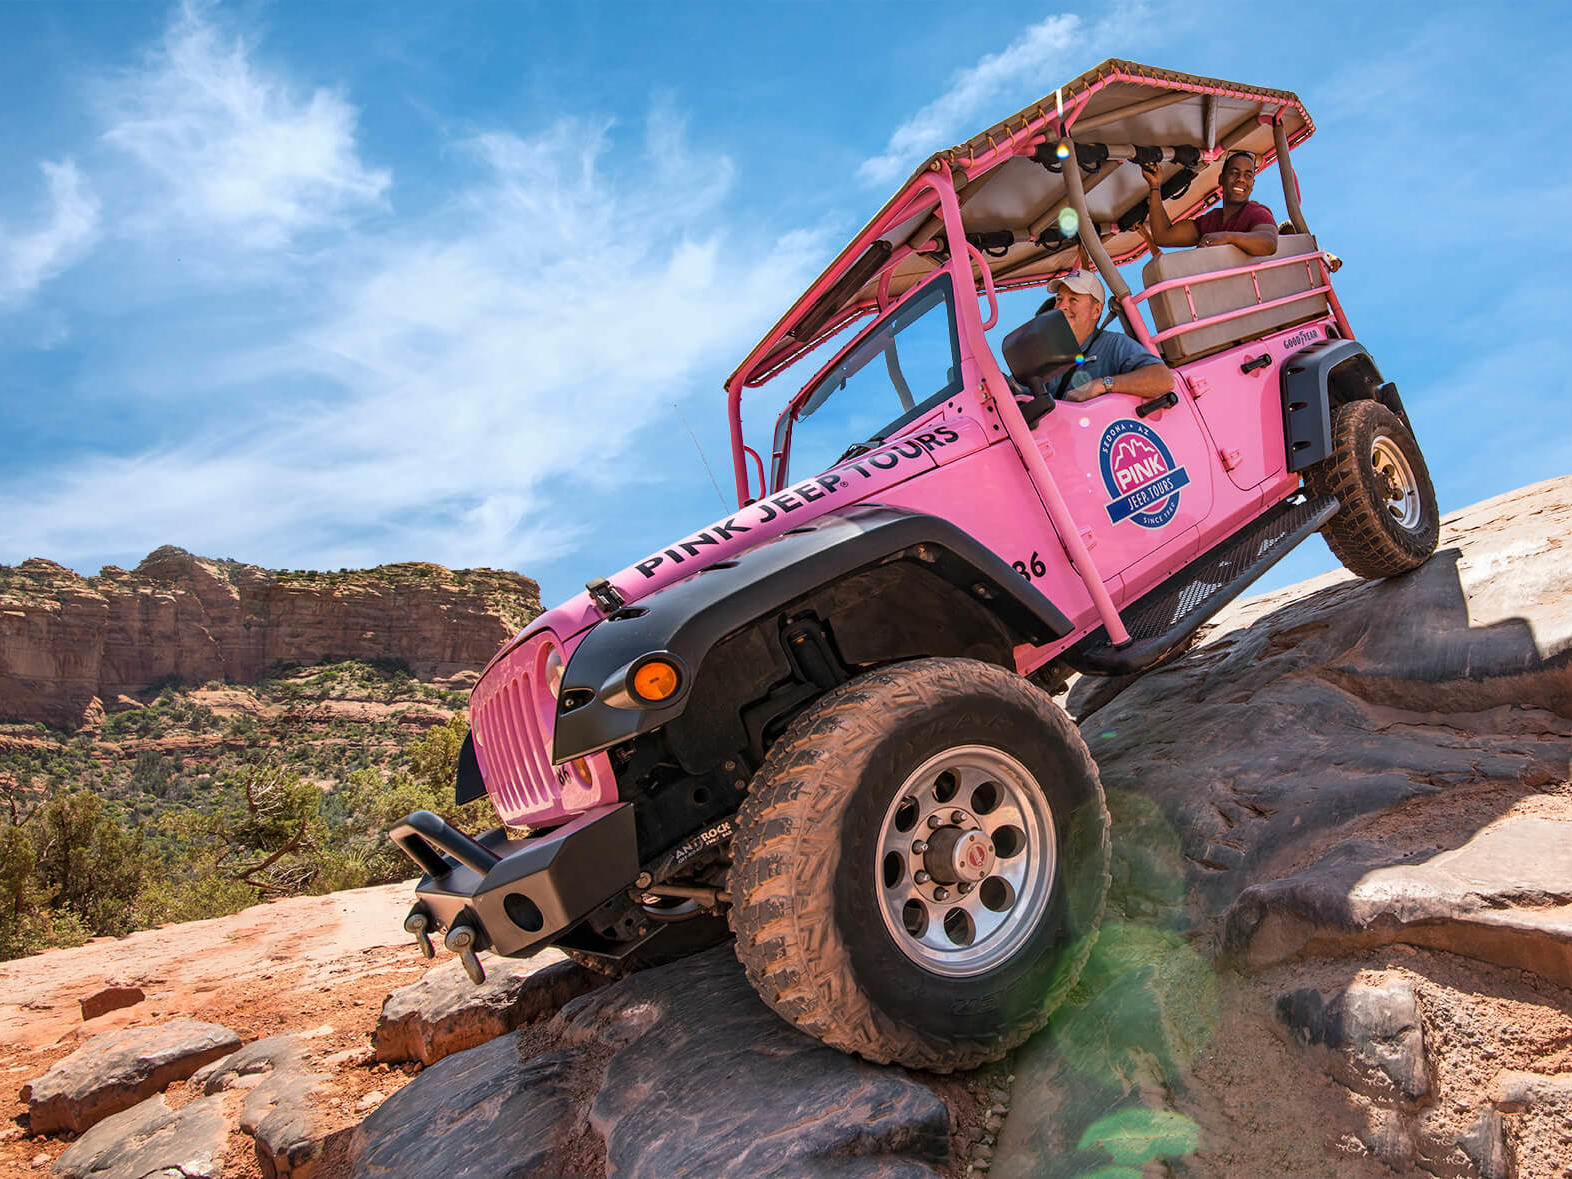 Pink Jeep Tours jeep on an Arizona off-road trek.